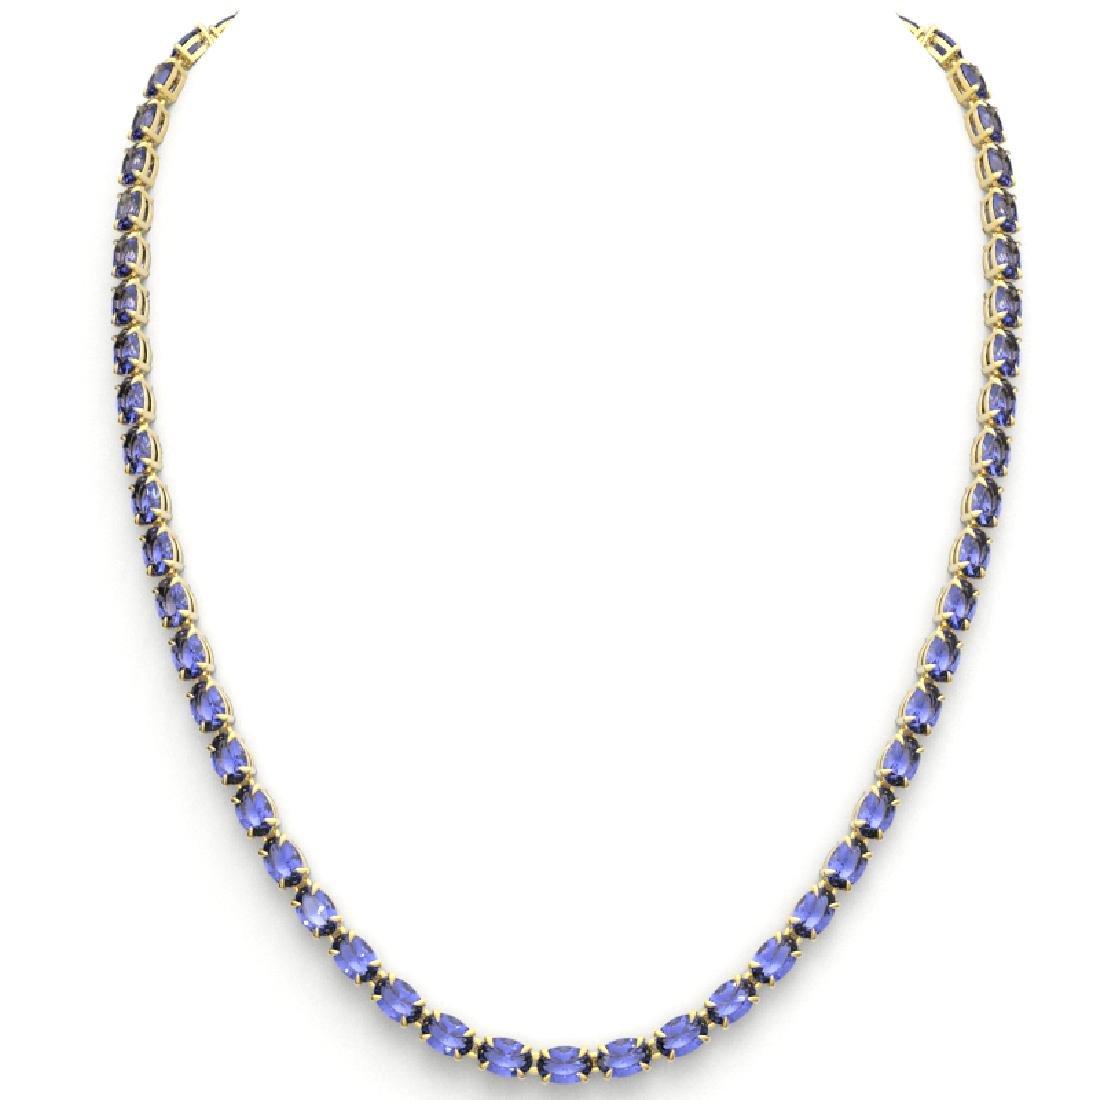 40 CTW Tanzanite Eternity Tennis Necklace 14K Yellow - 3